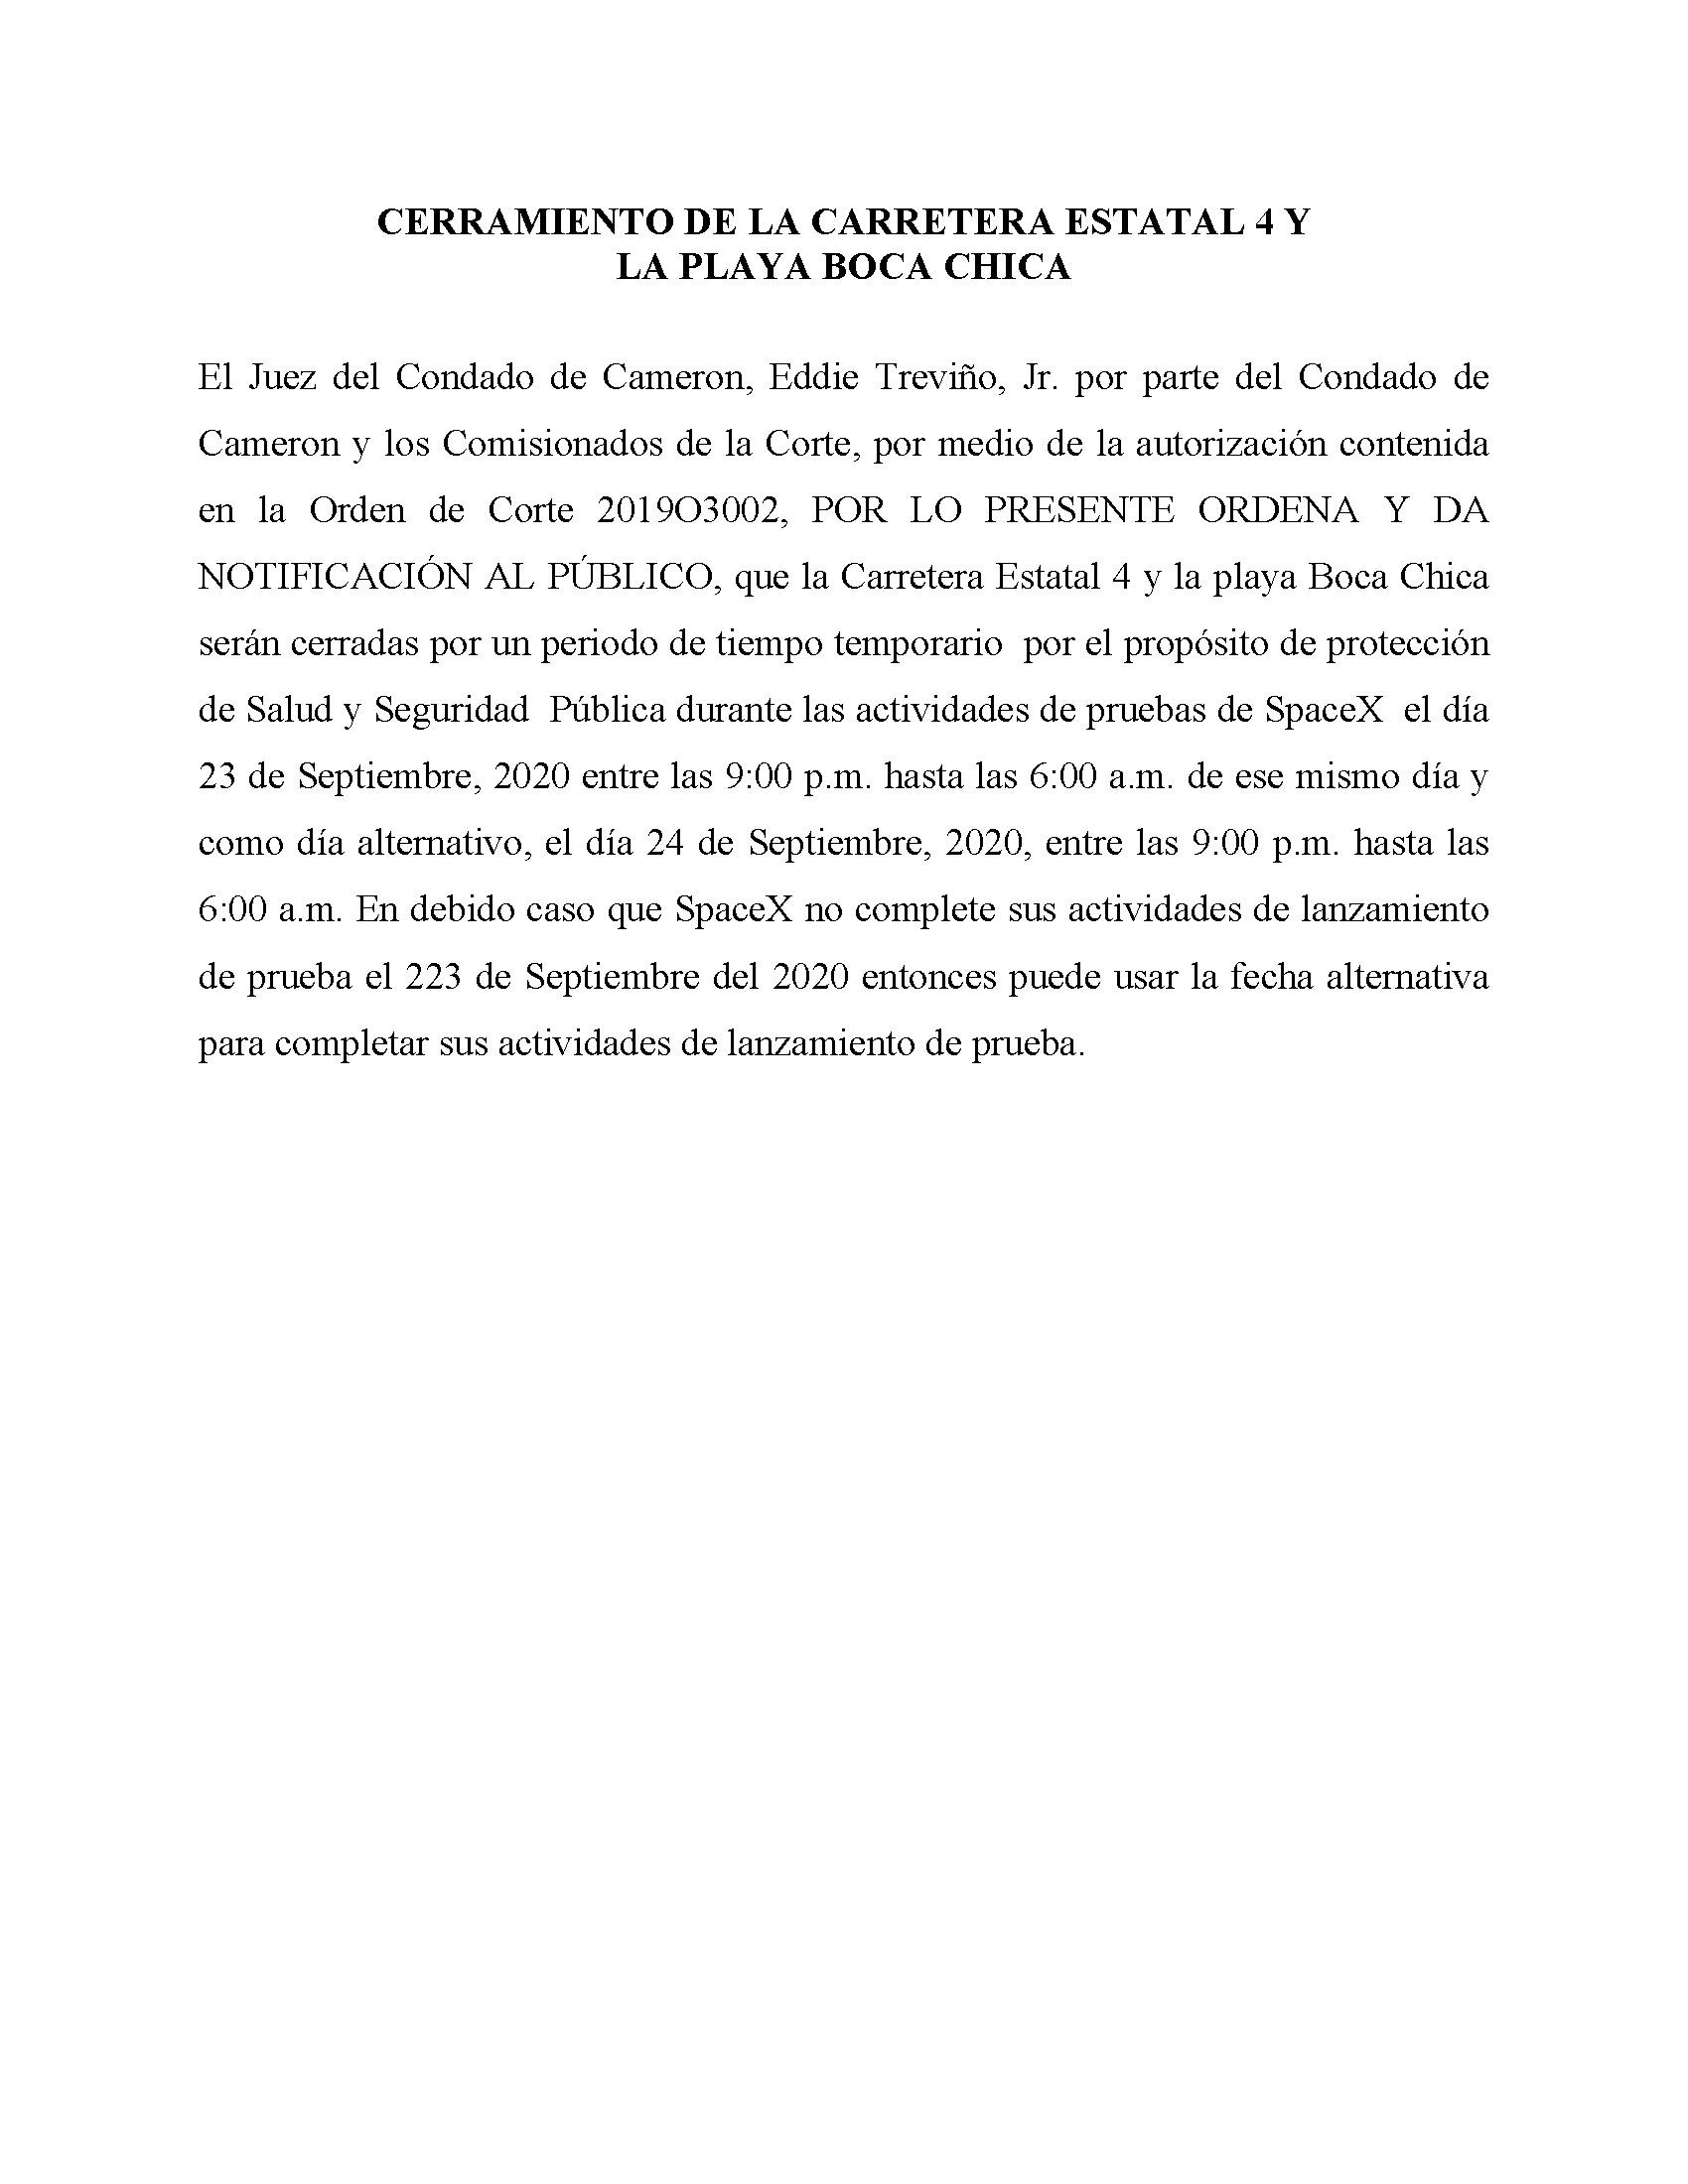 ORDER.CLOSURE OF HIGHWAY 4 Y LA PLAYA BOCA CHICA.SPANISH.9.2324.20